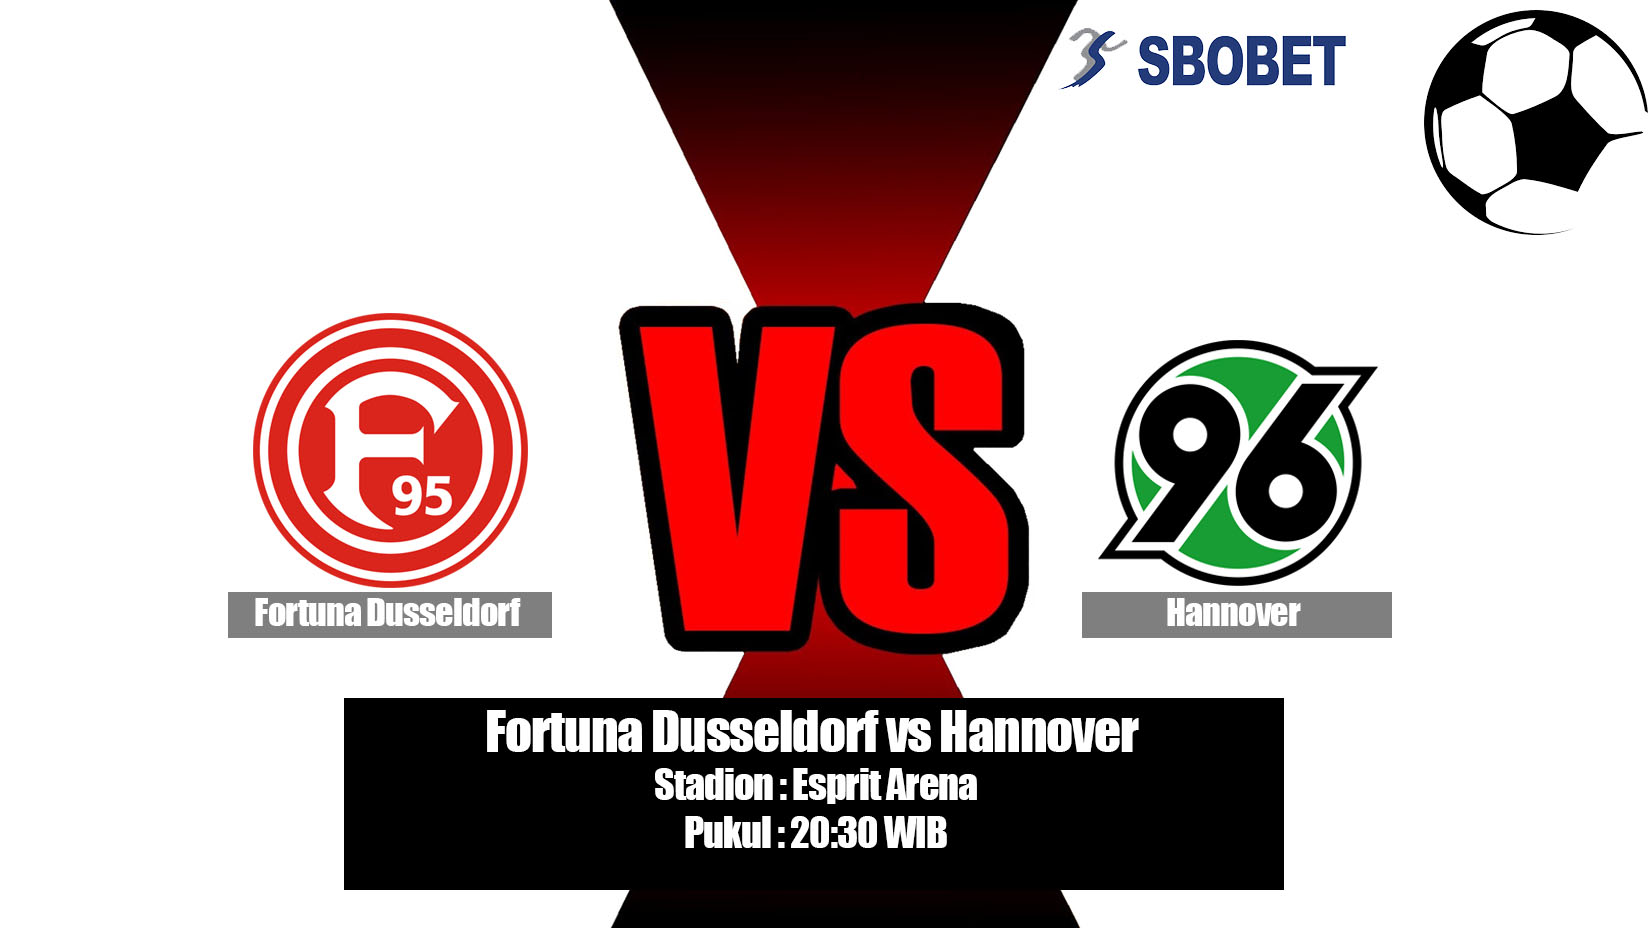 Prediksi Bola Fortuna Dusseldorf vs Hannover 18 Mei 2019